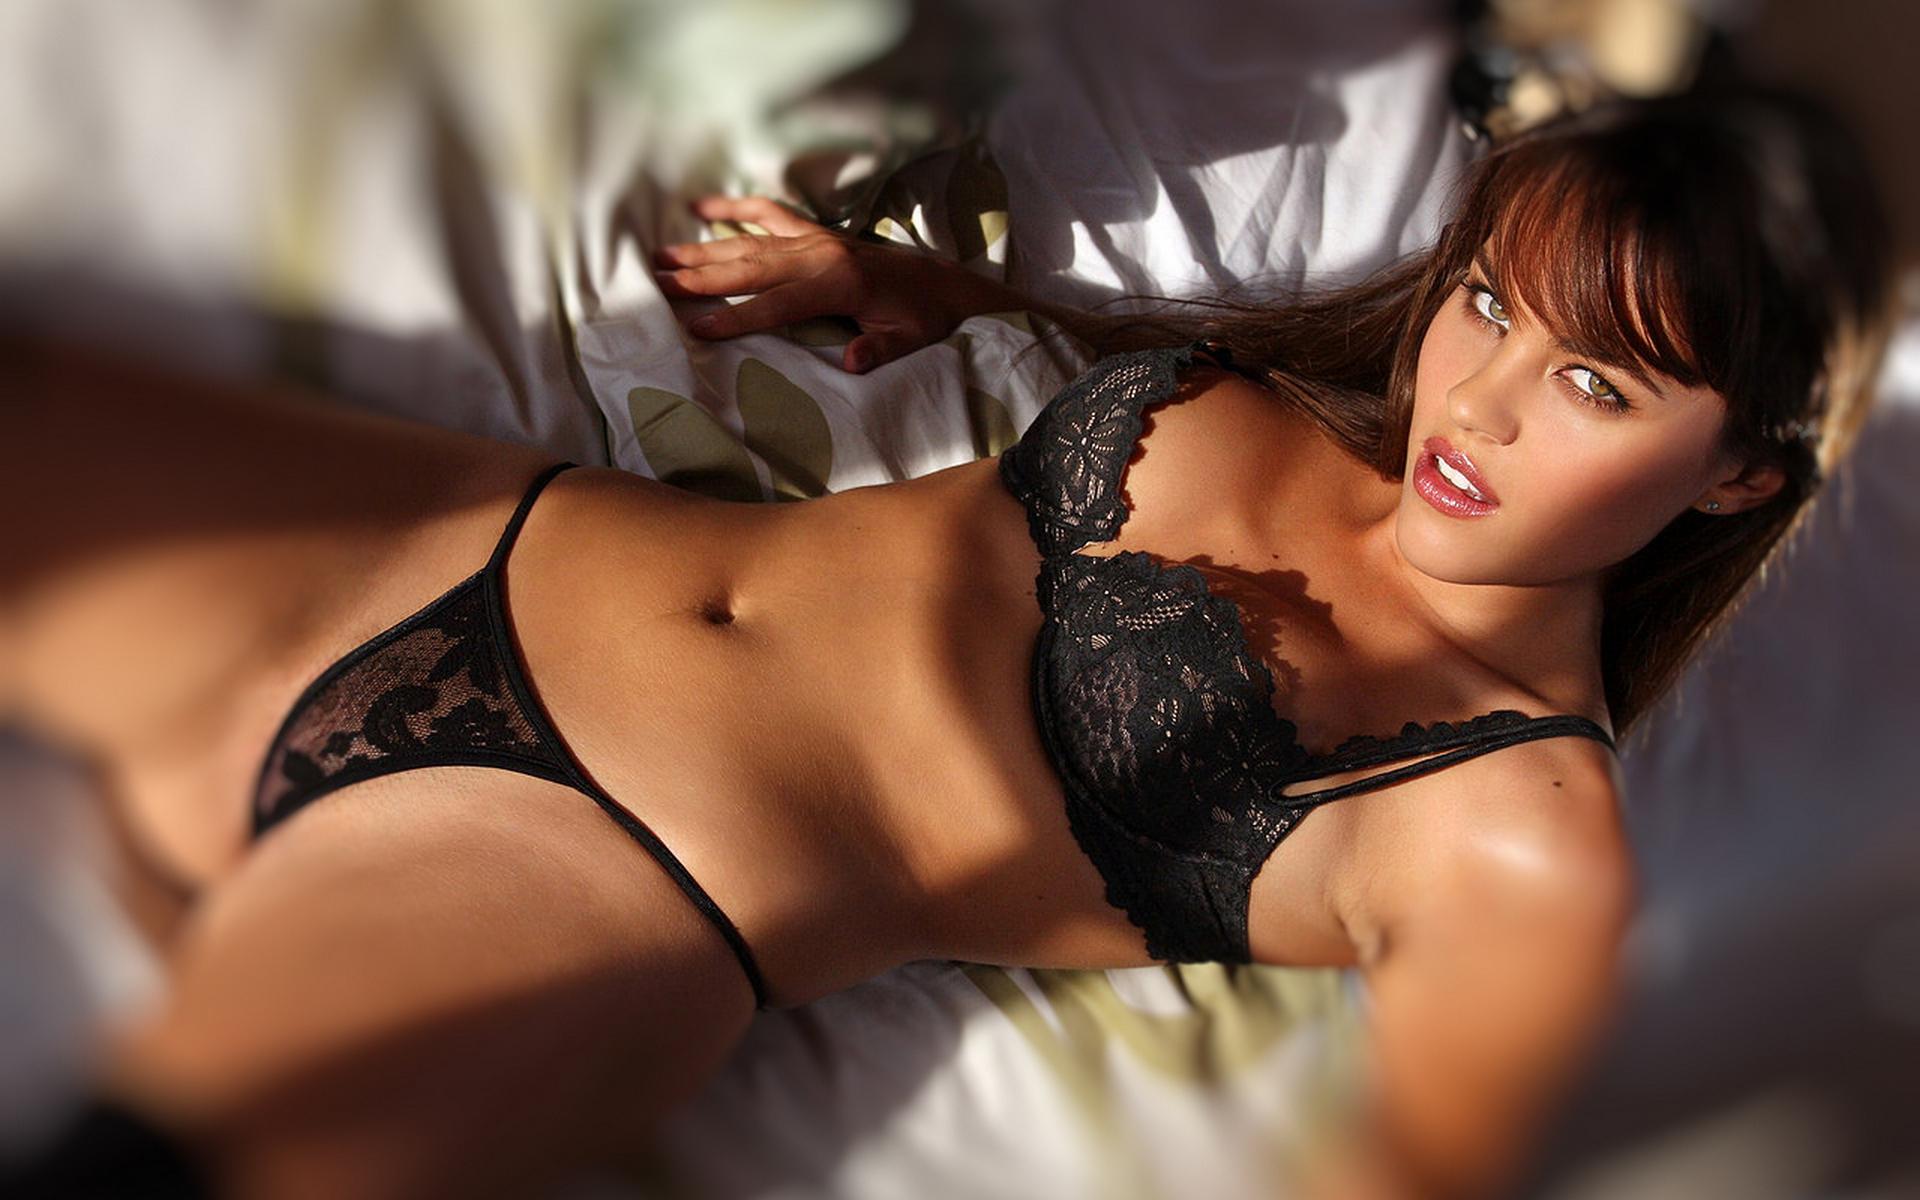 yaoi-sex-women-sexy-video-adore